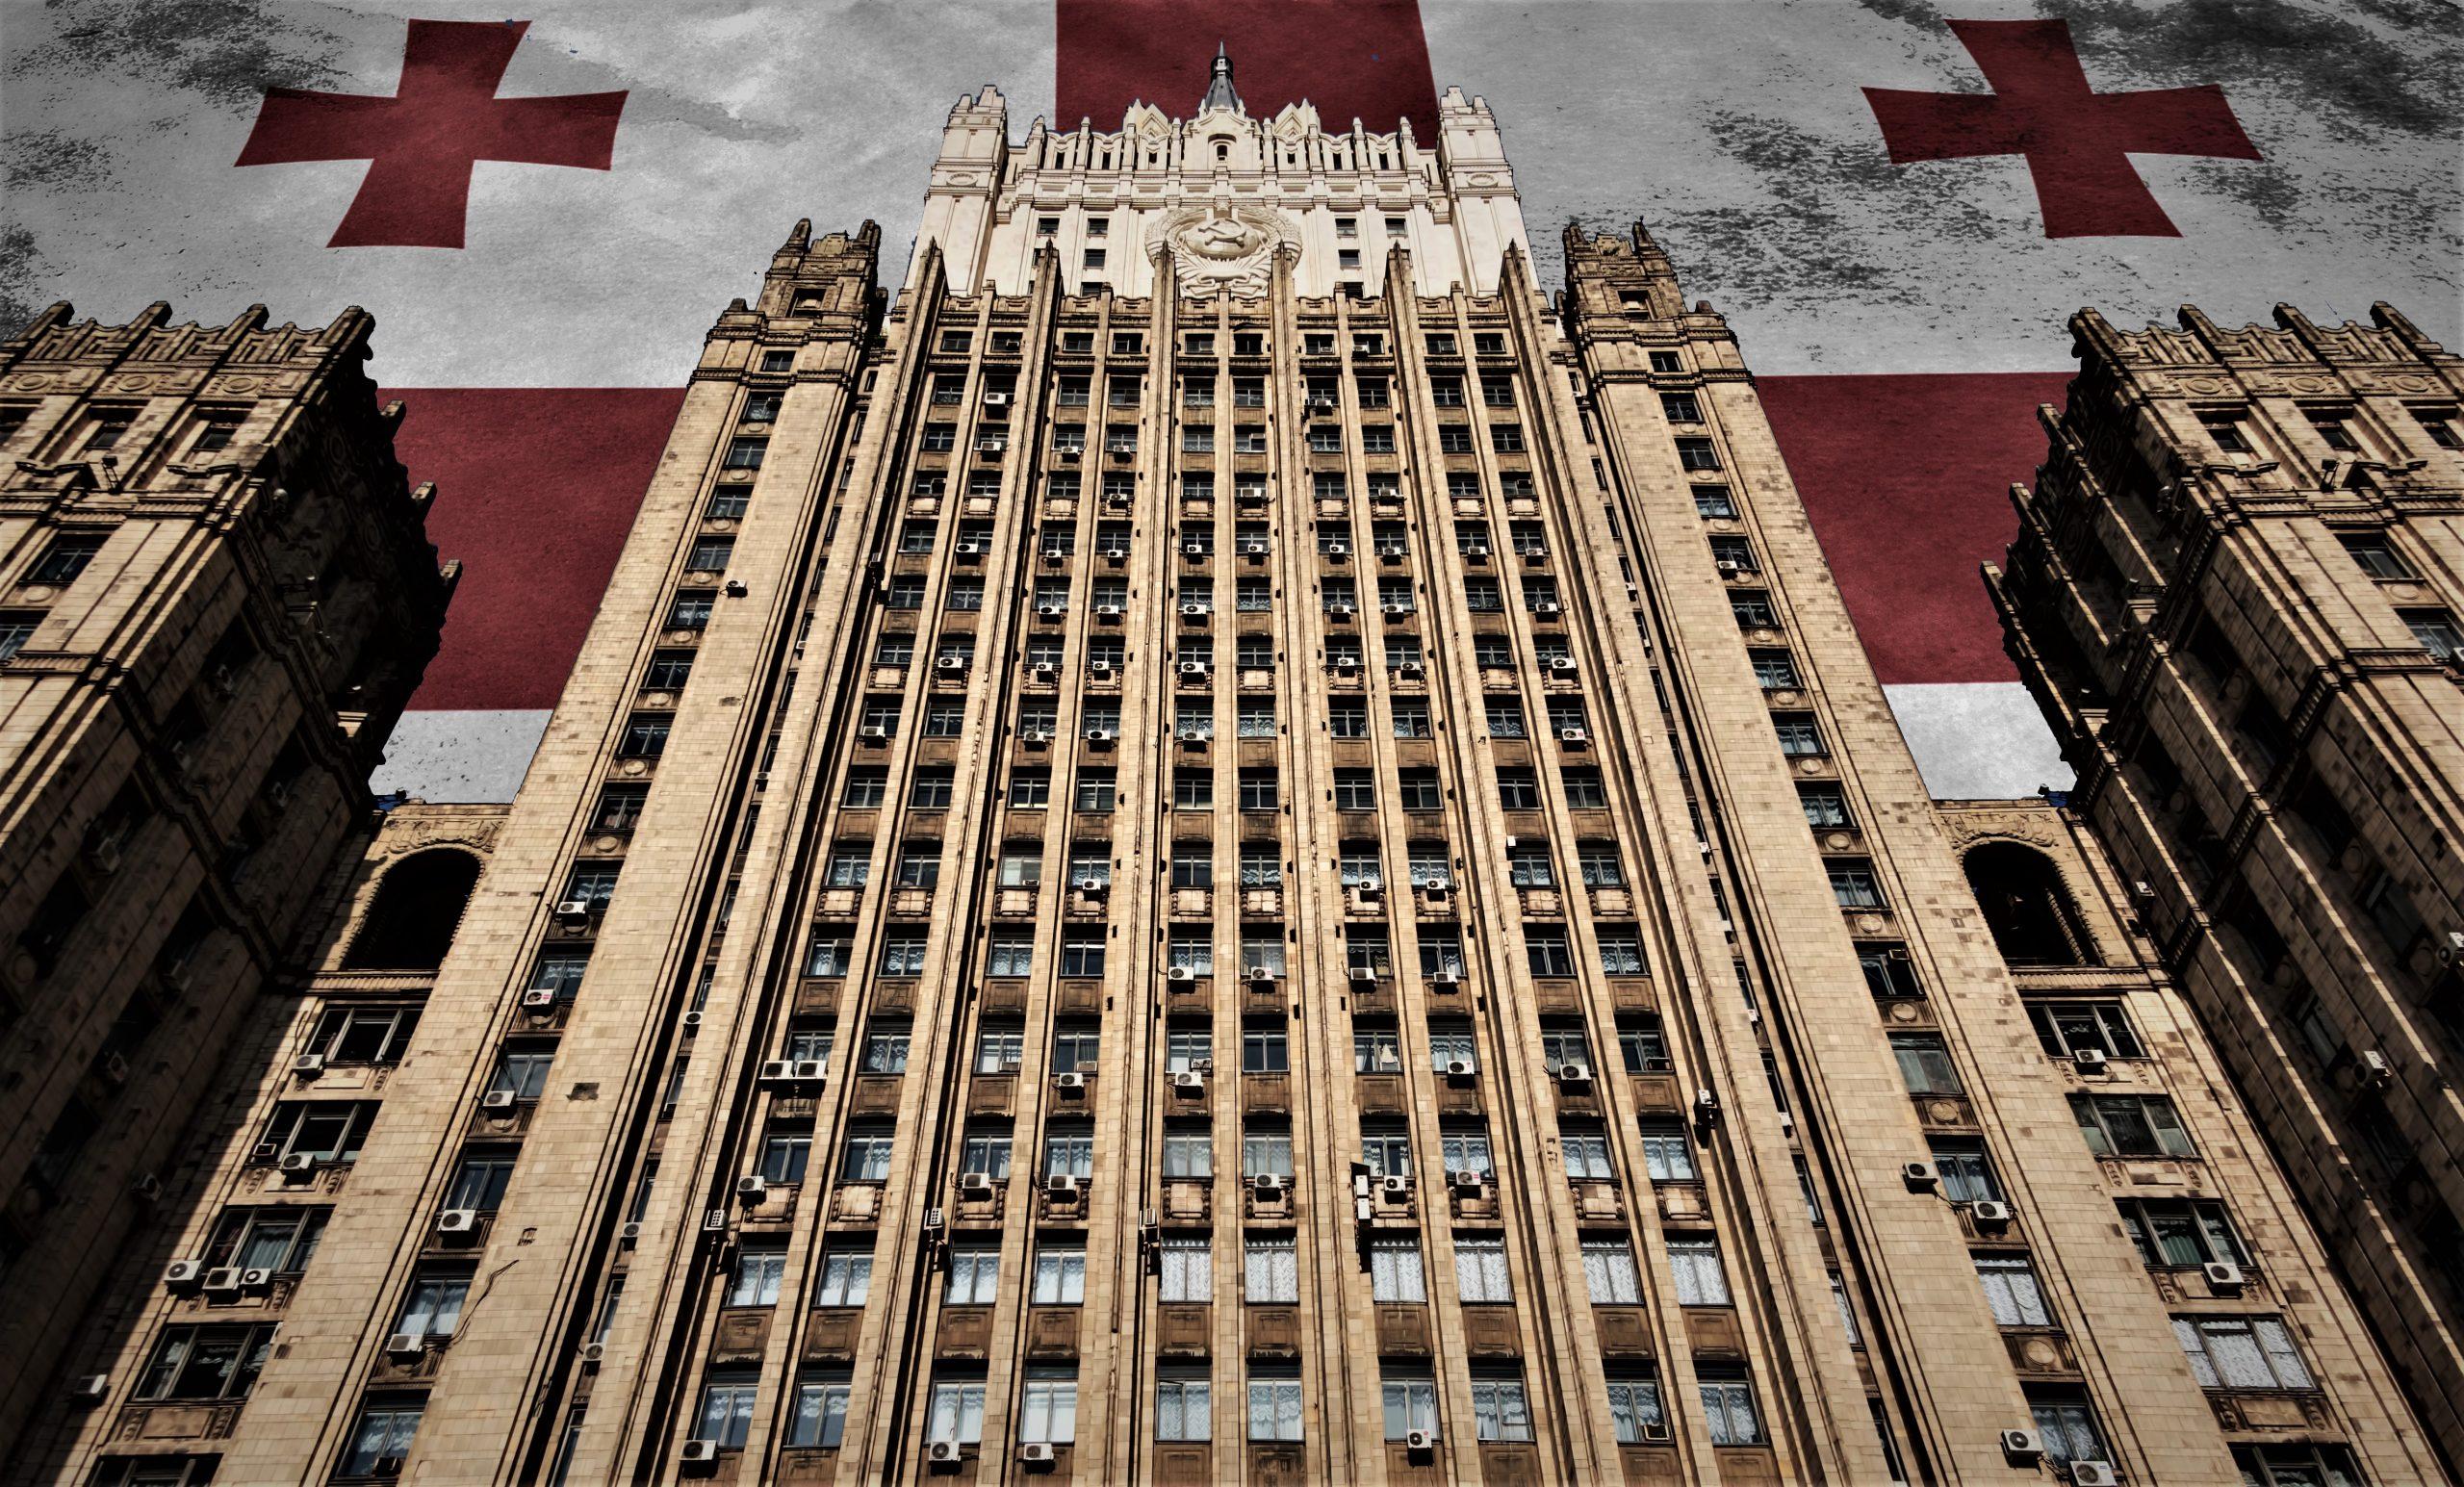 354737453775 scaled #политика featured, Александр Бикантов, война 2008, Георгий Бадридзе, Грузия-Россия, Торнике Шарашенидзе